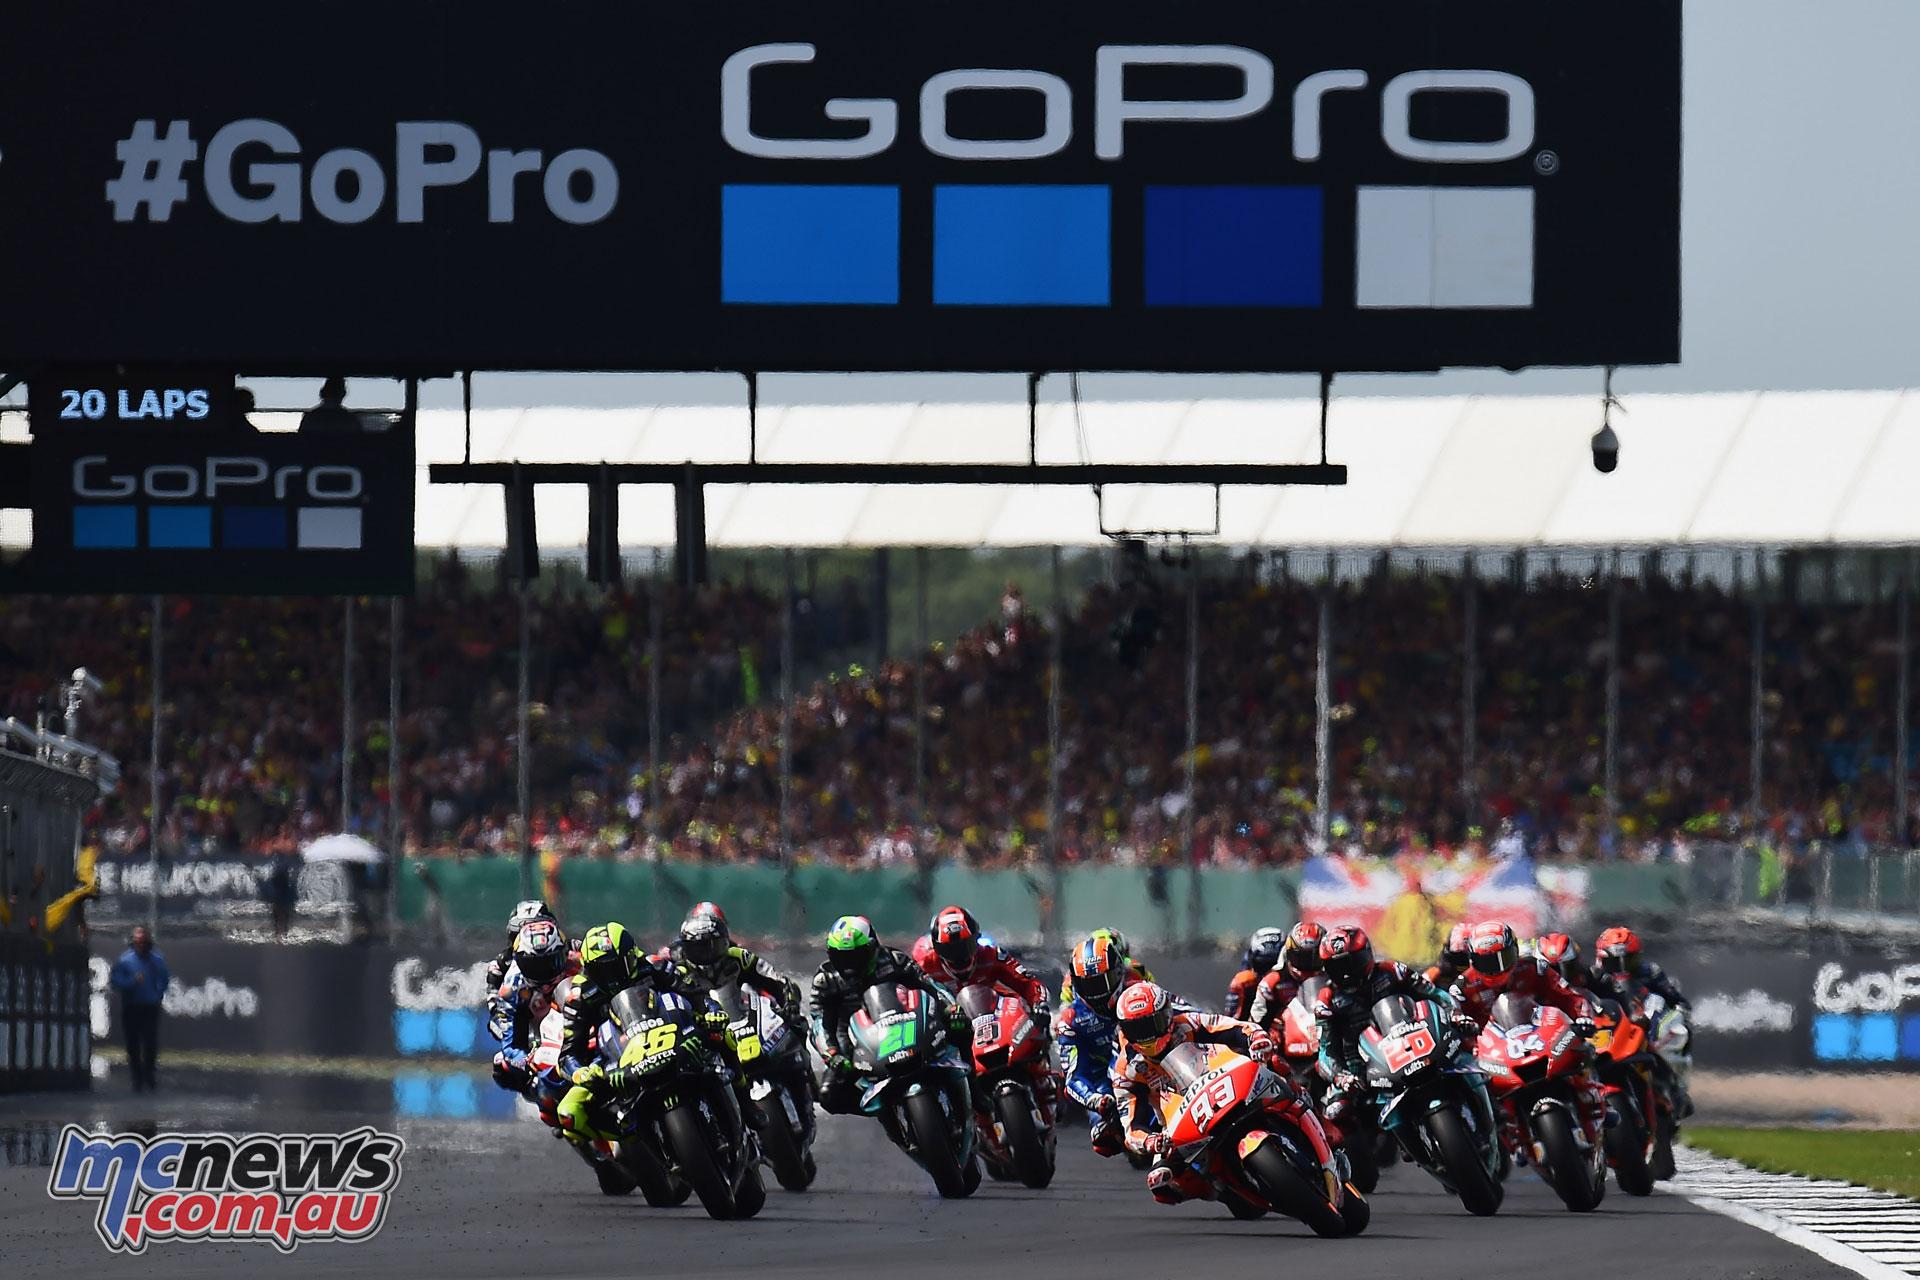 MotoGP Rnd Silverstone Start